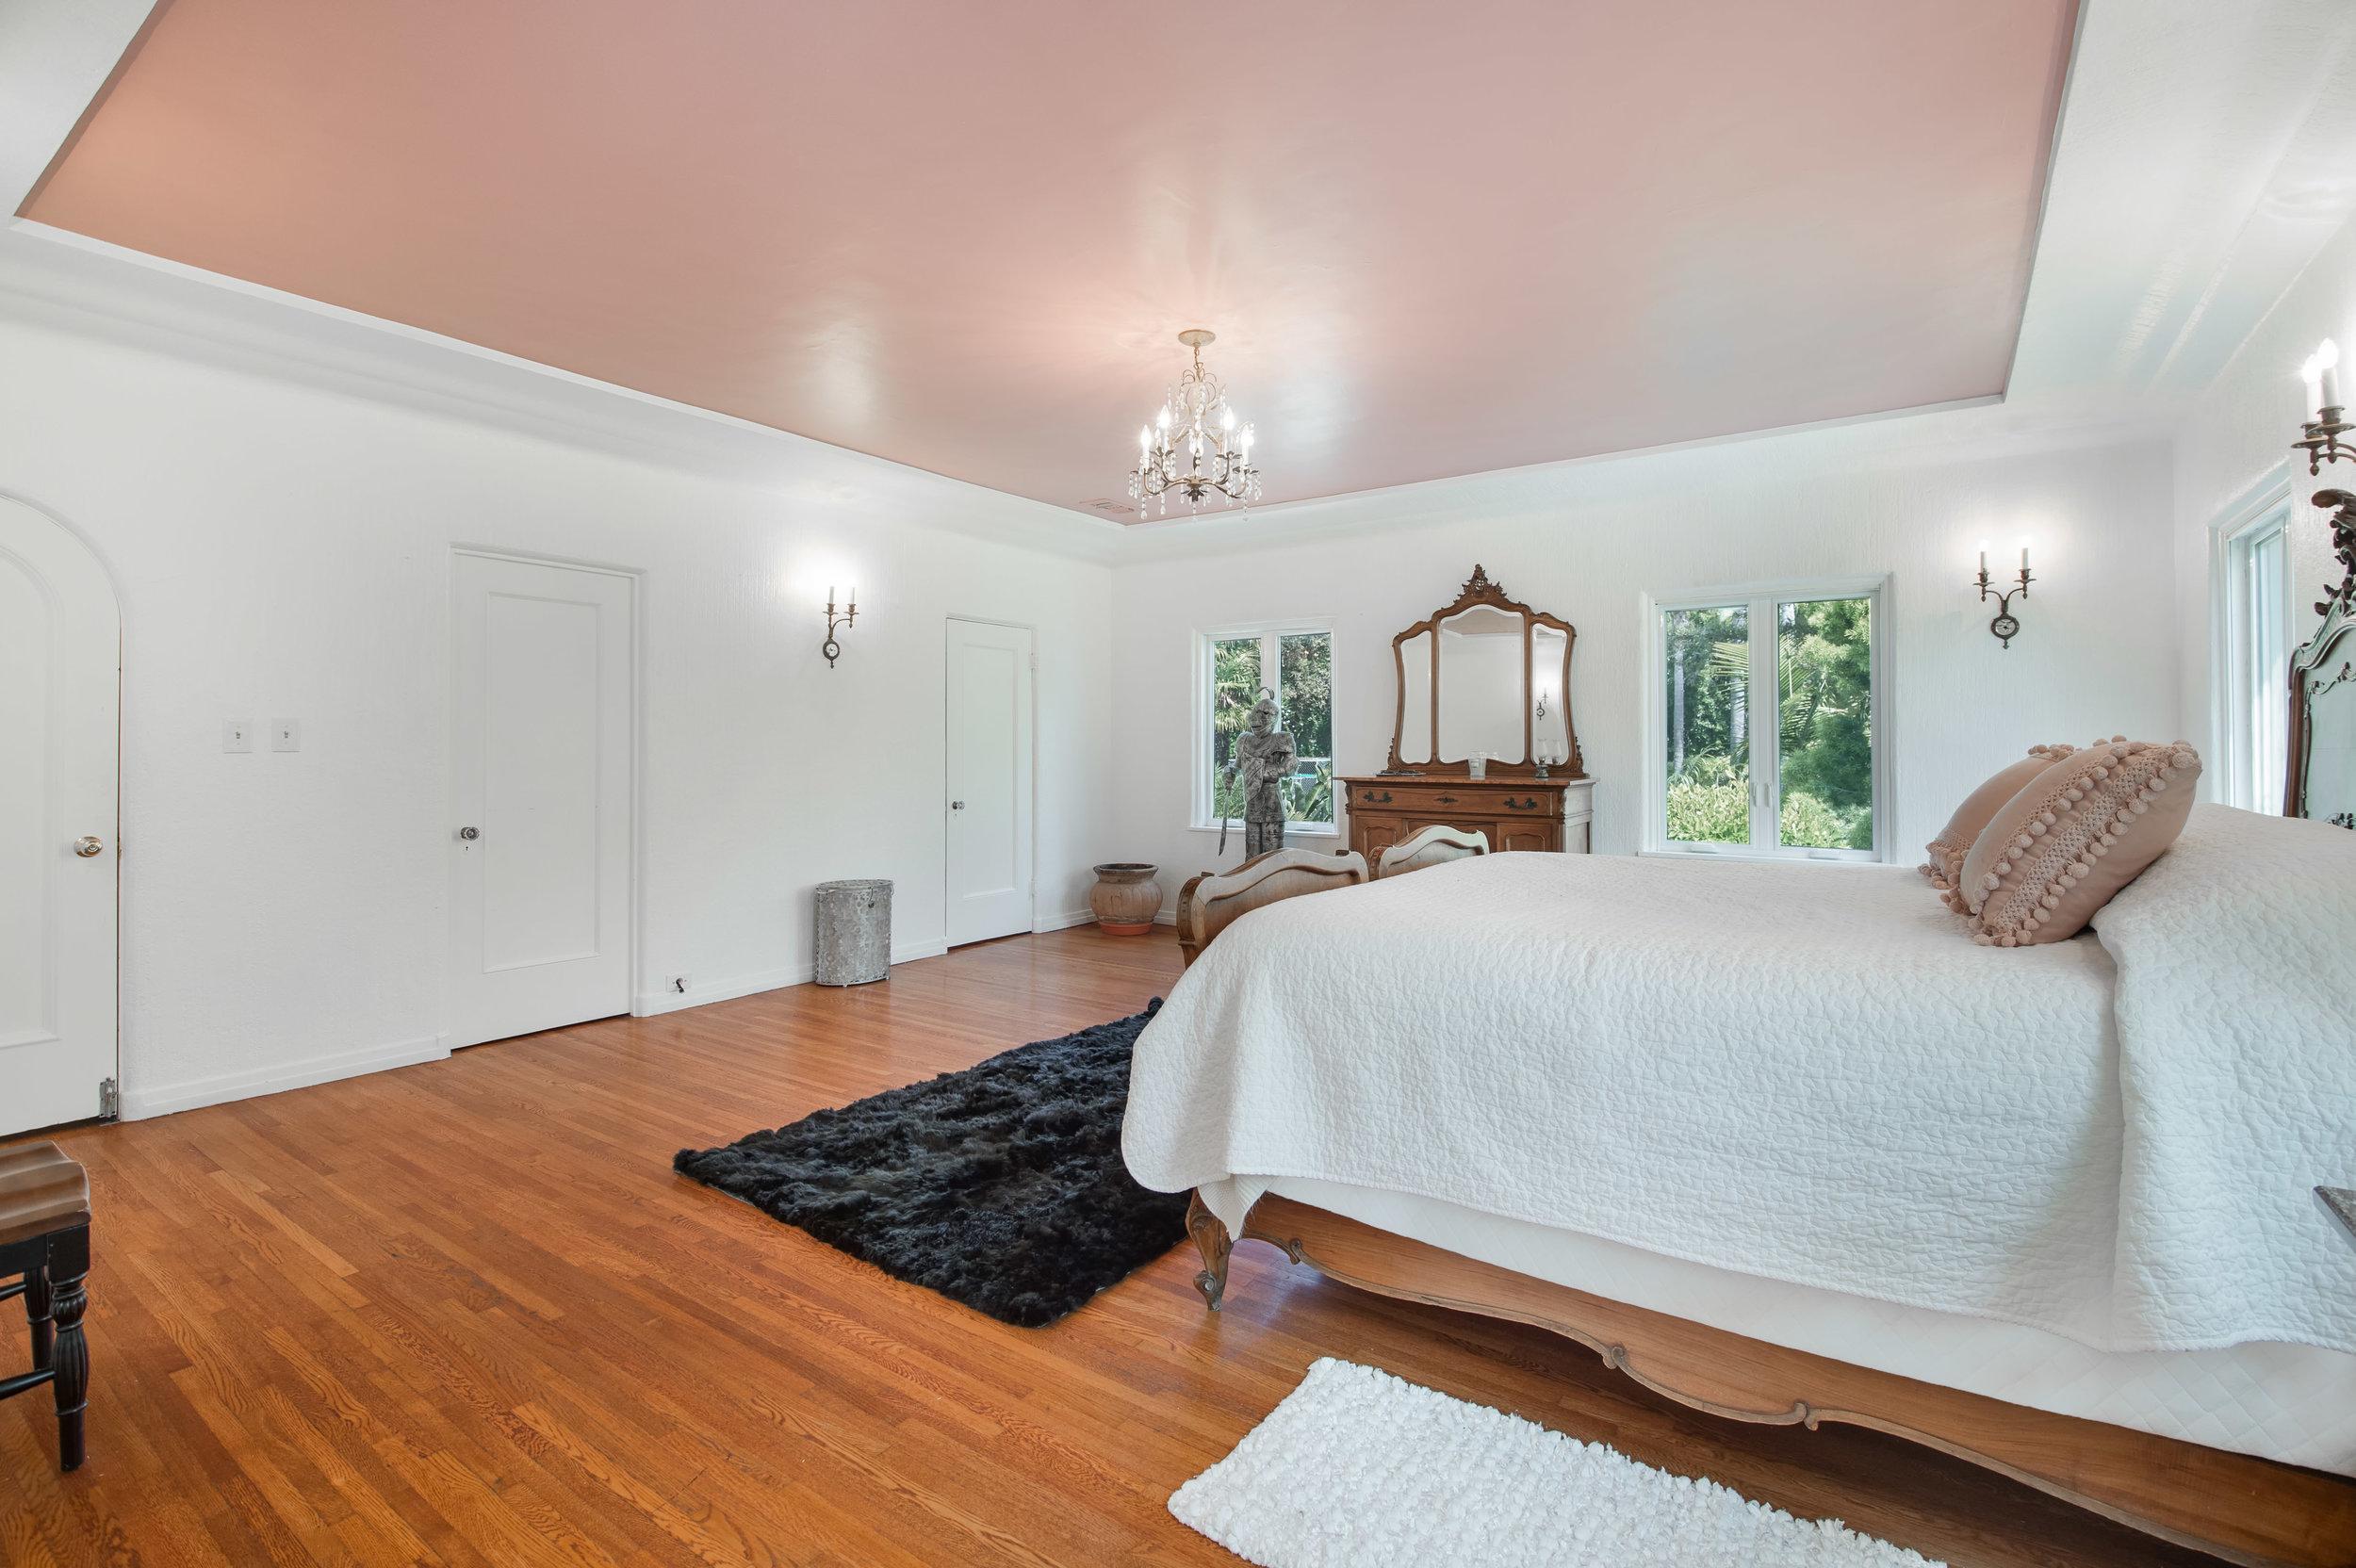 017 Bedroom 006 Pool 4915 Los Feliz For Sale Los Angeles Lease The Malibu Life Team Luxury Real Estate.jpg